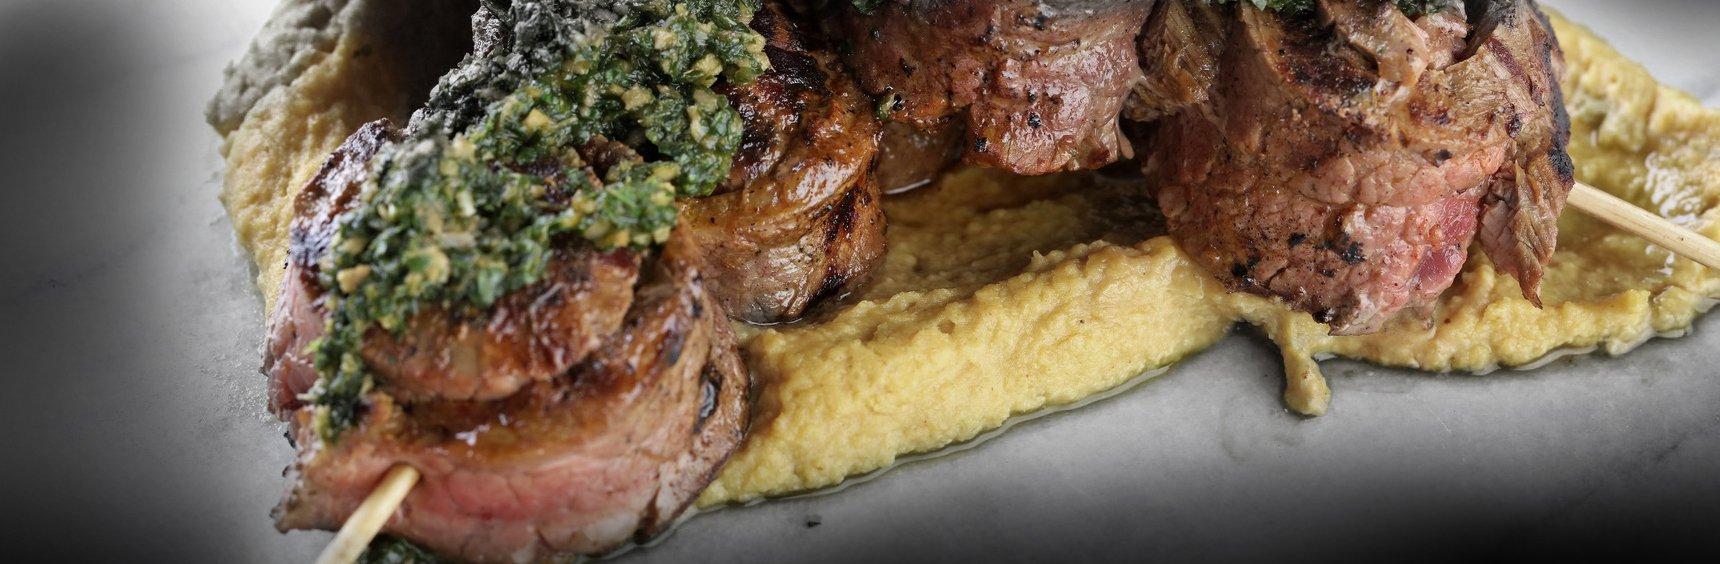 Flank steak tandoori